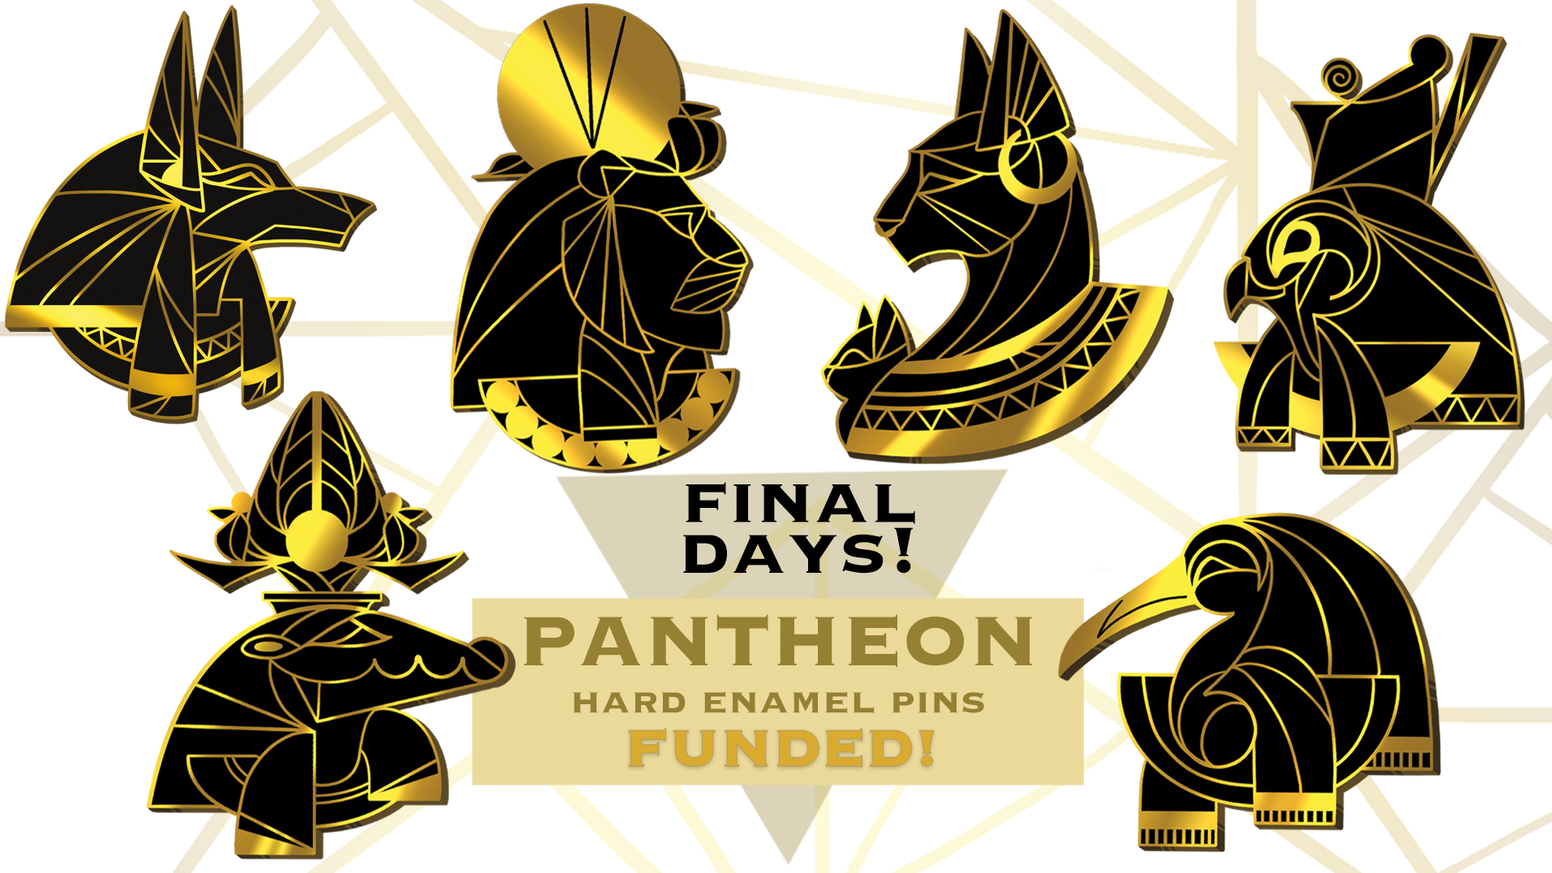 Egyptian Pantheon Hard Enamel Pins by Triangle Art — Kickstarter